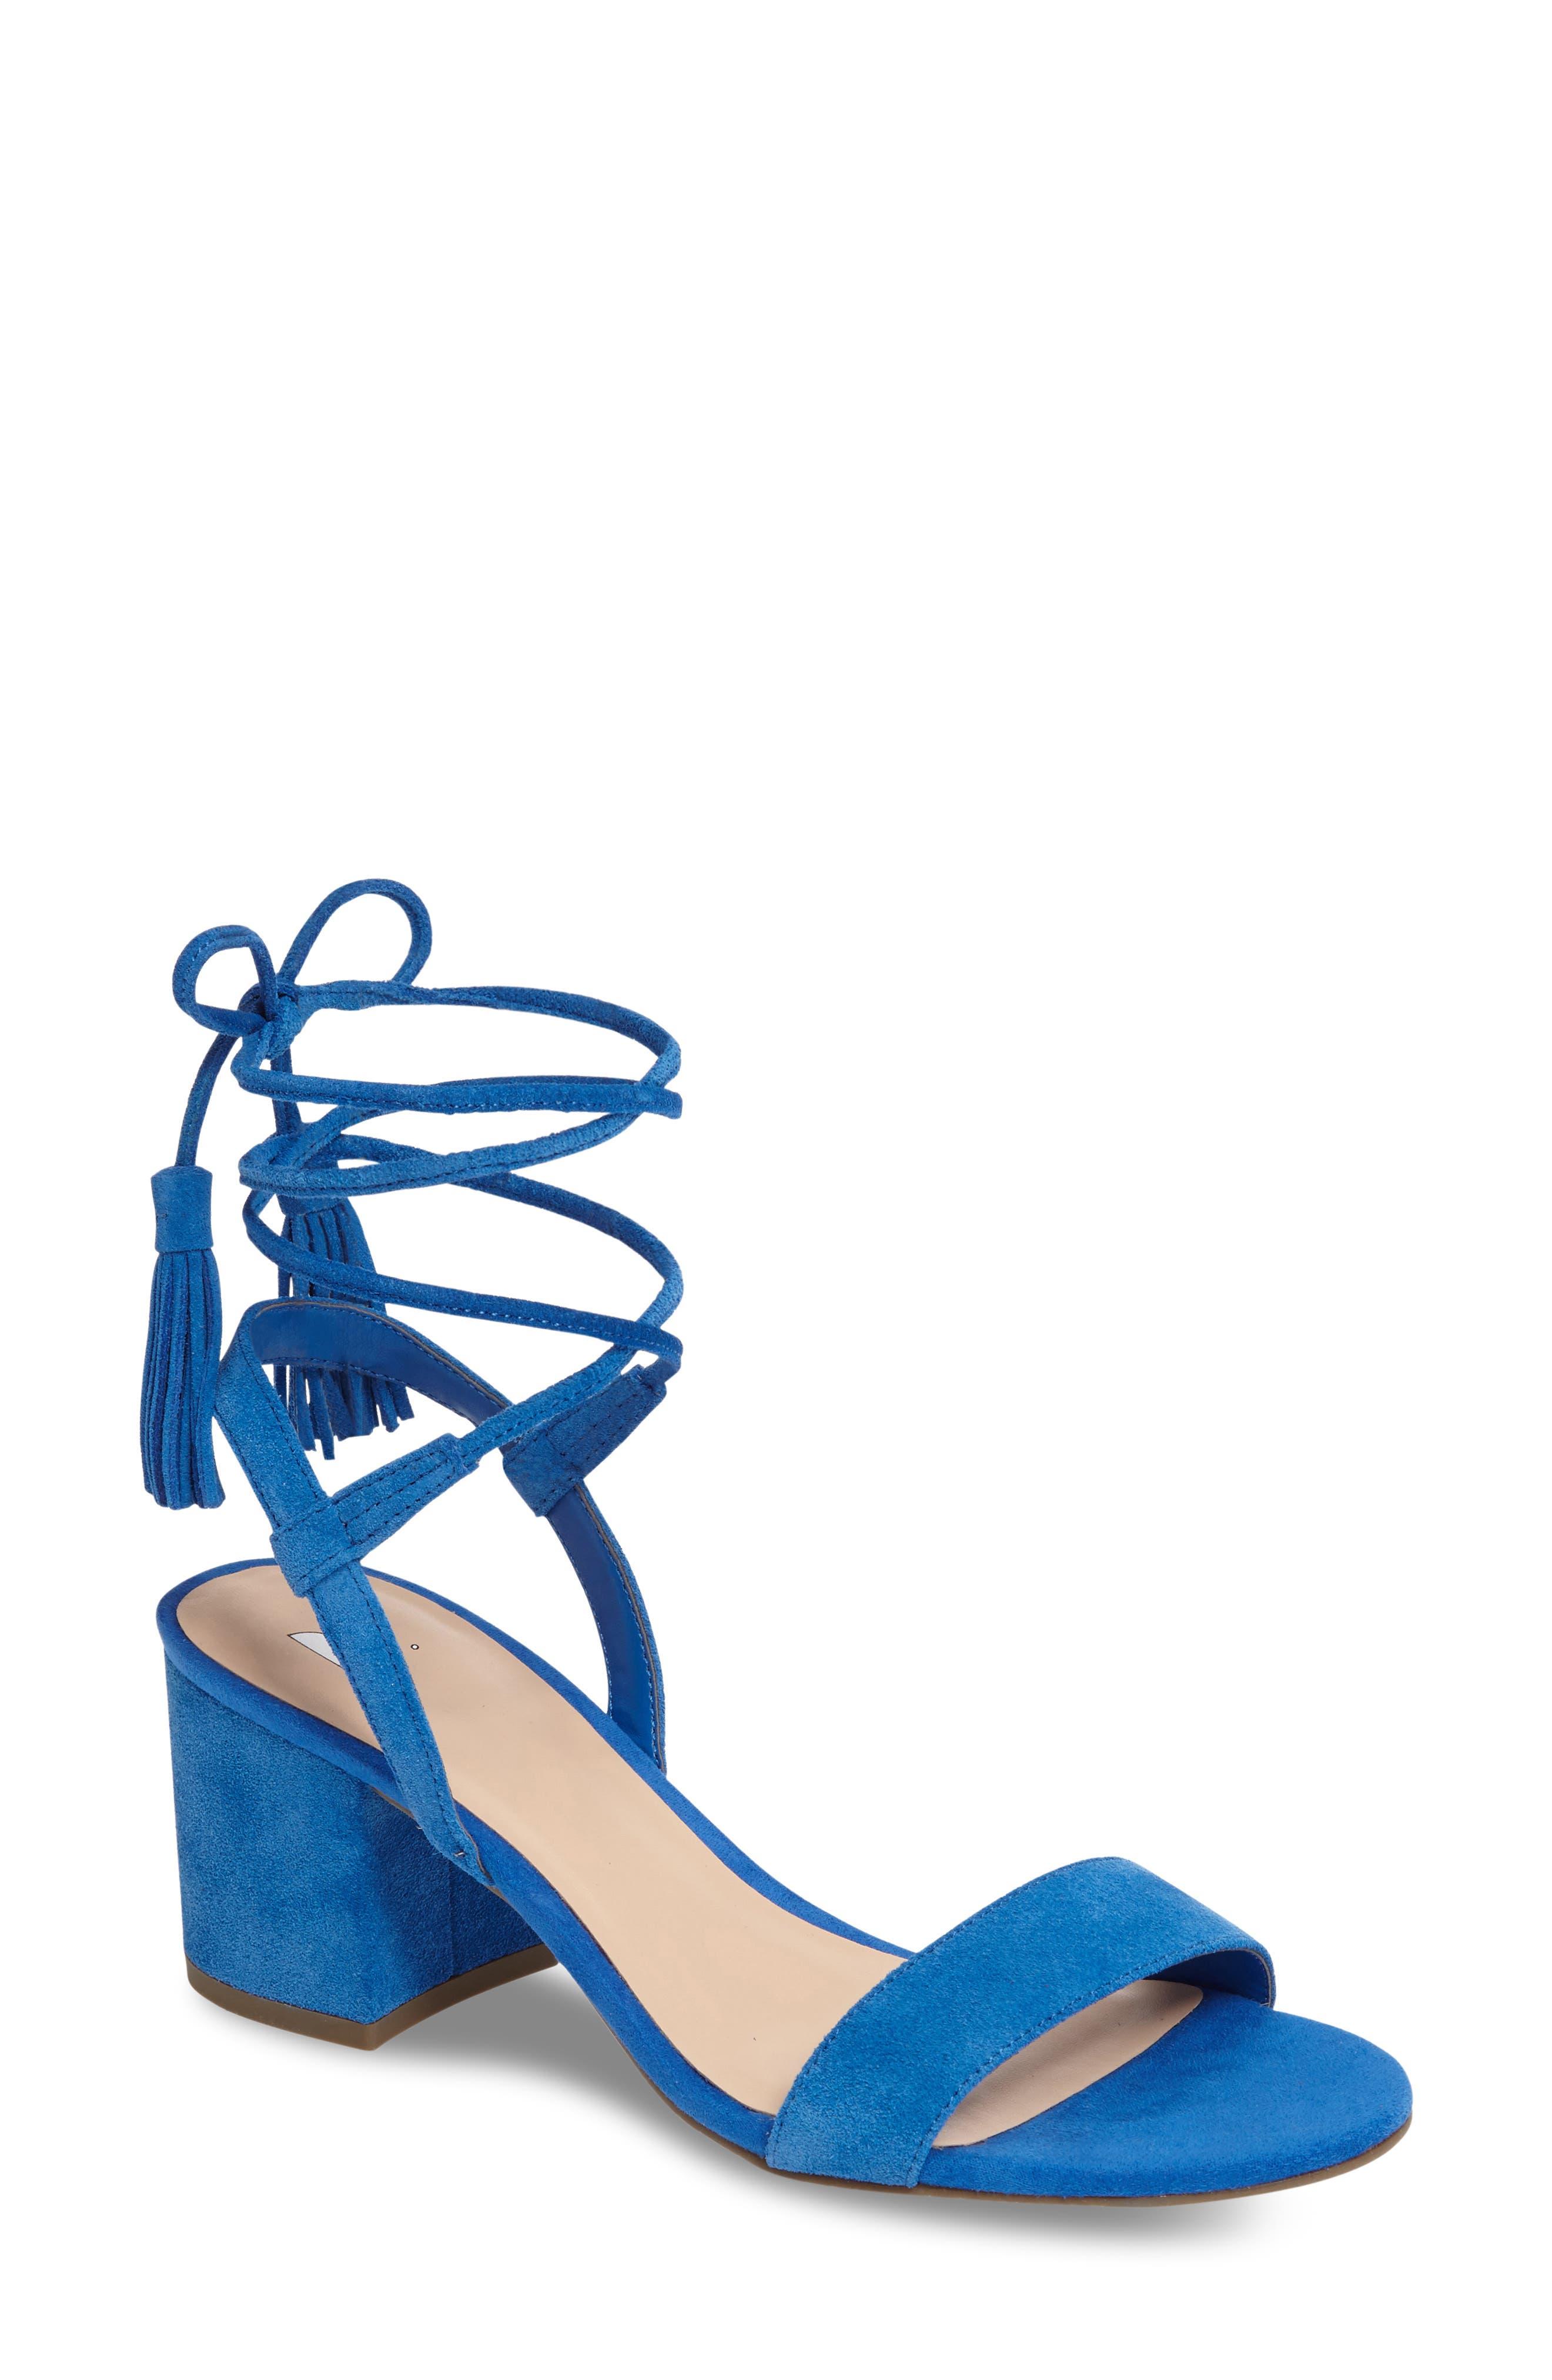 Alternate Image 1 Selected - BP. Karla Block Heel Ankle Wrap Sandal (Women)